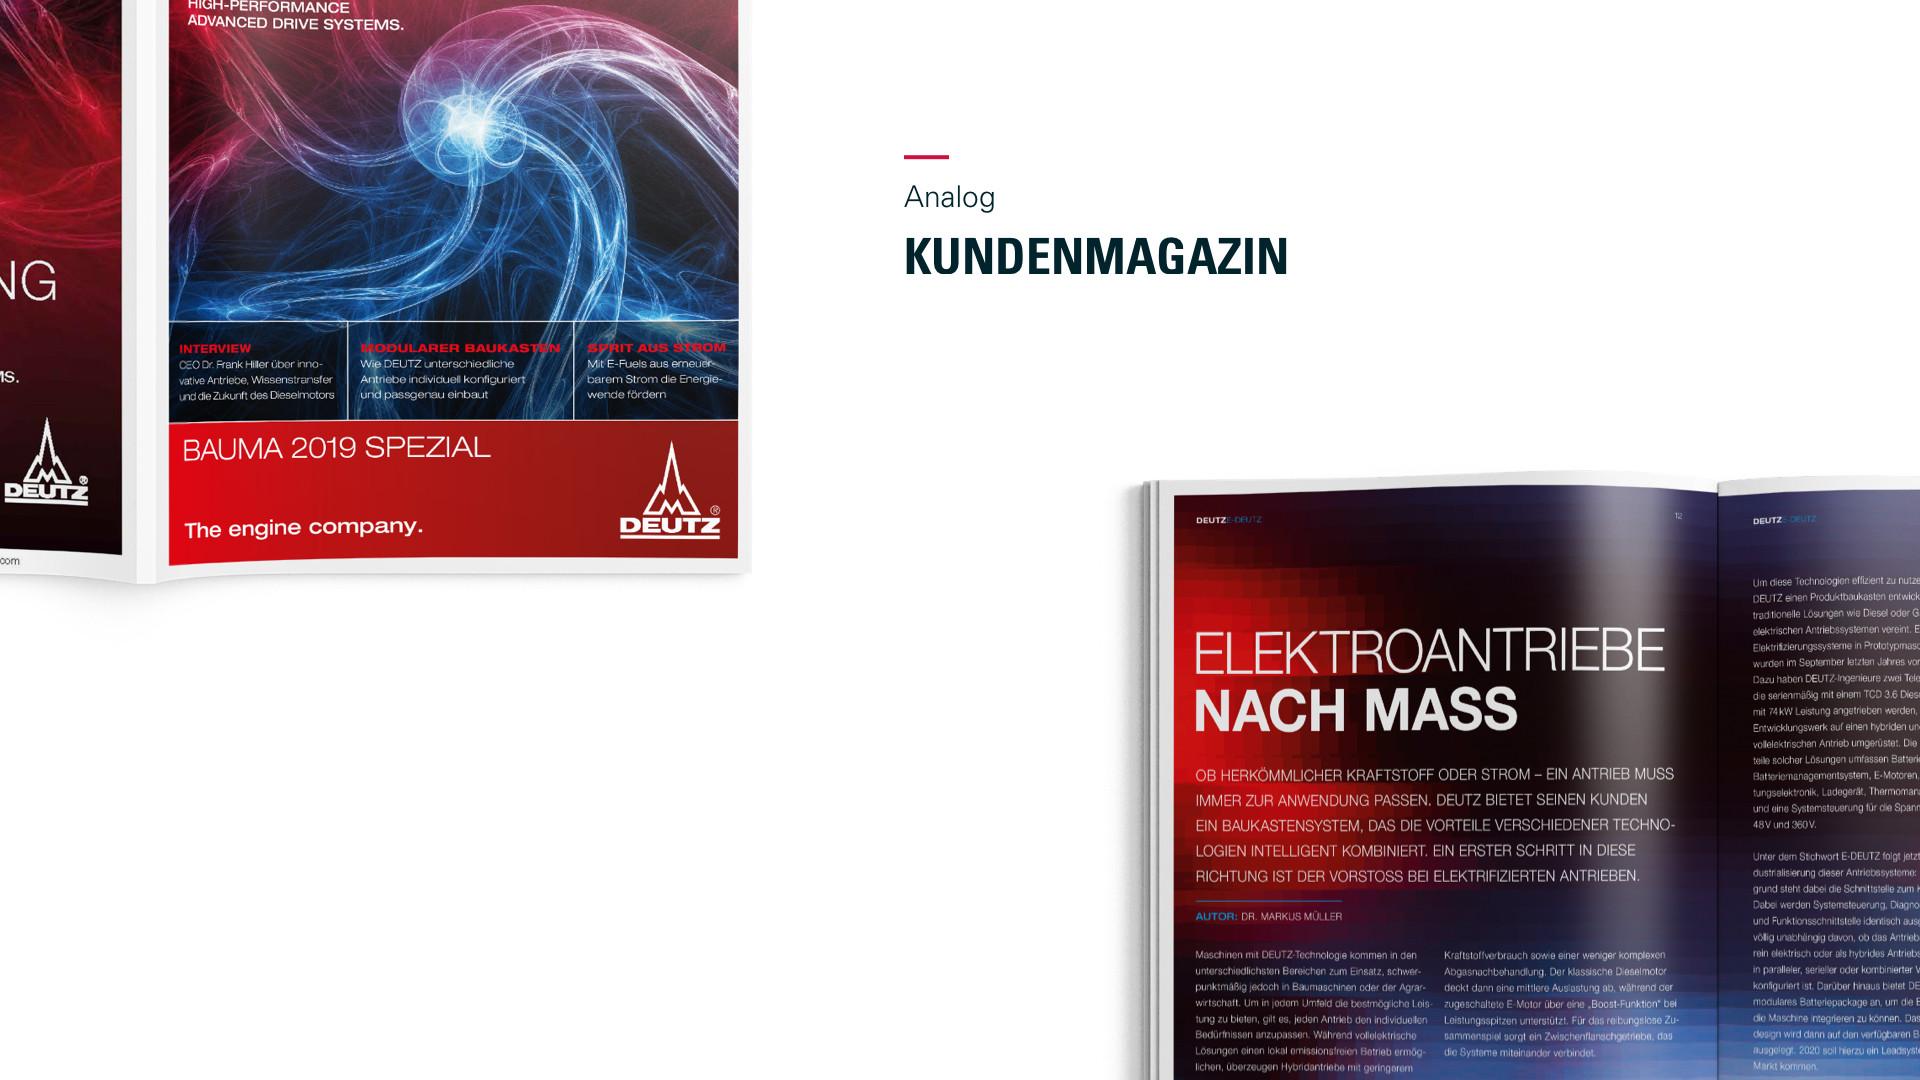 Deutz Kundenmagazin 2